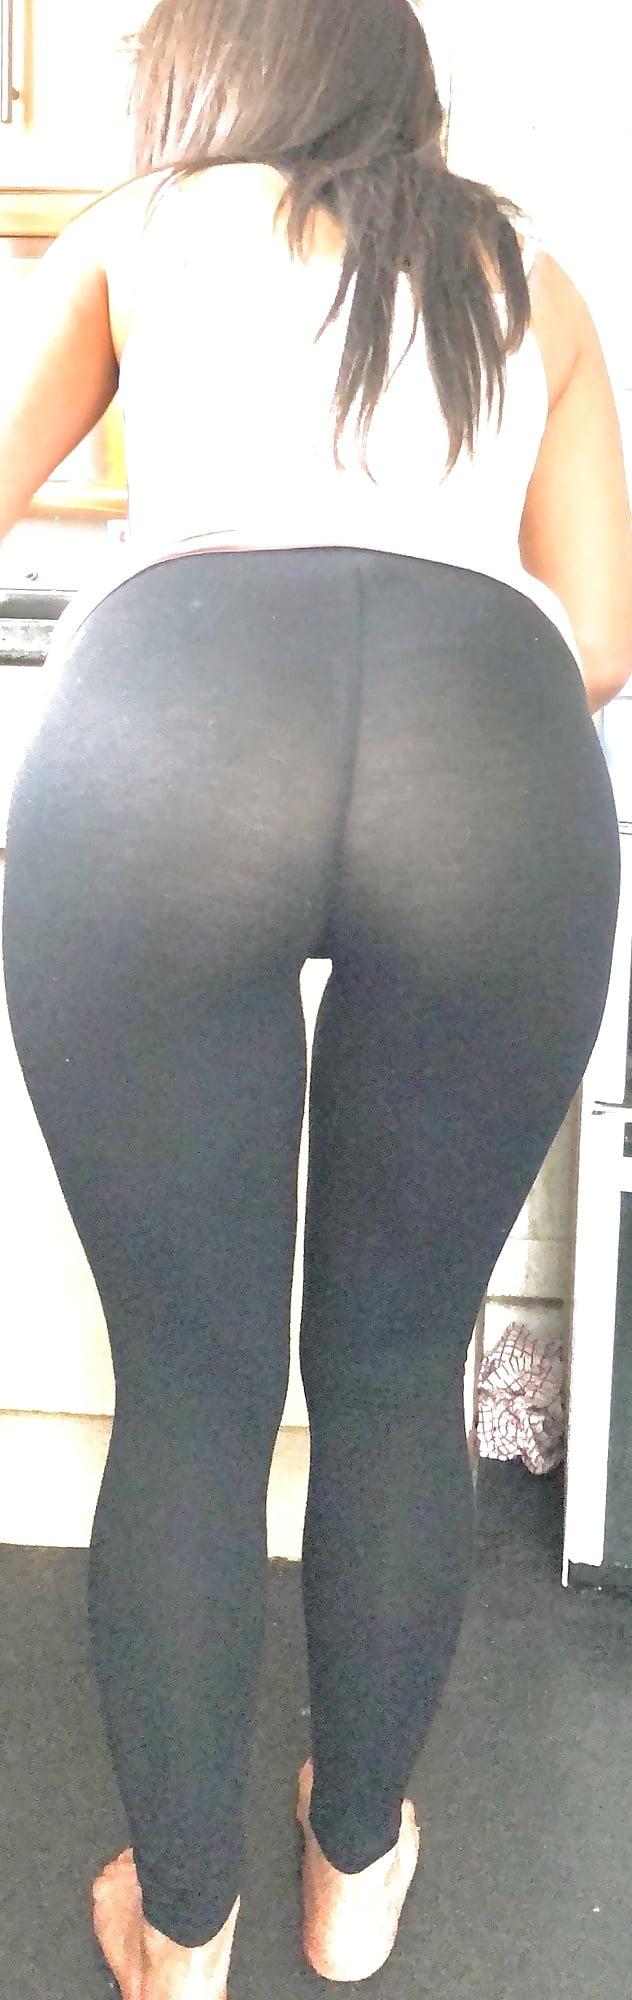 See Pussy Through Panties